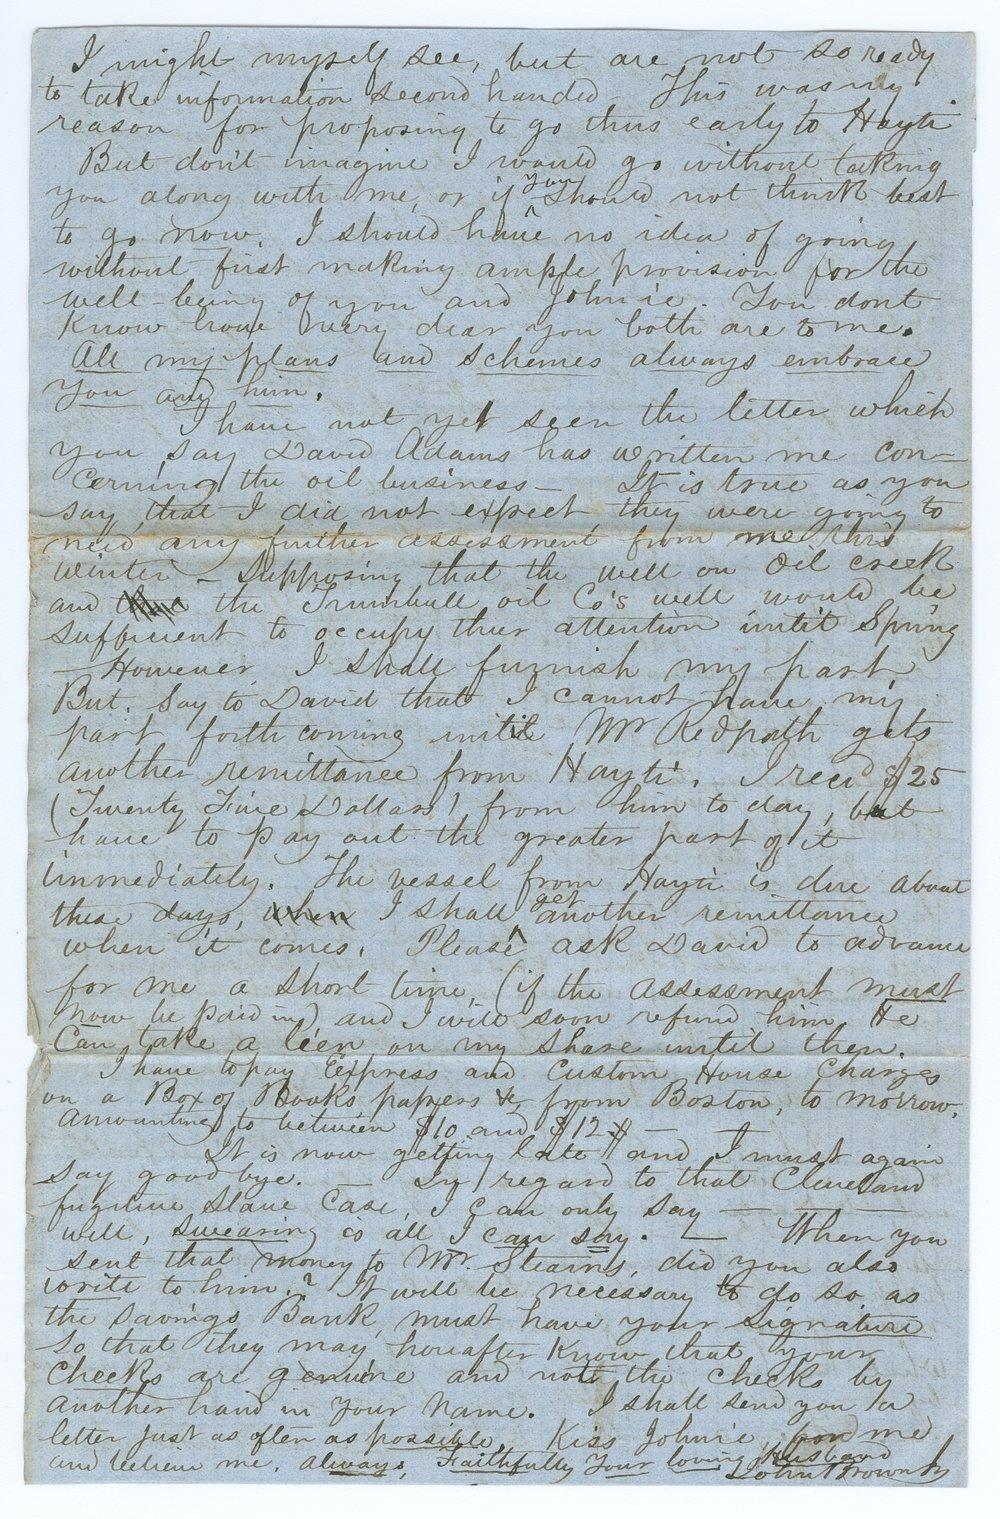 John Brown, Jr. correspondence - 4